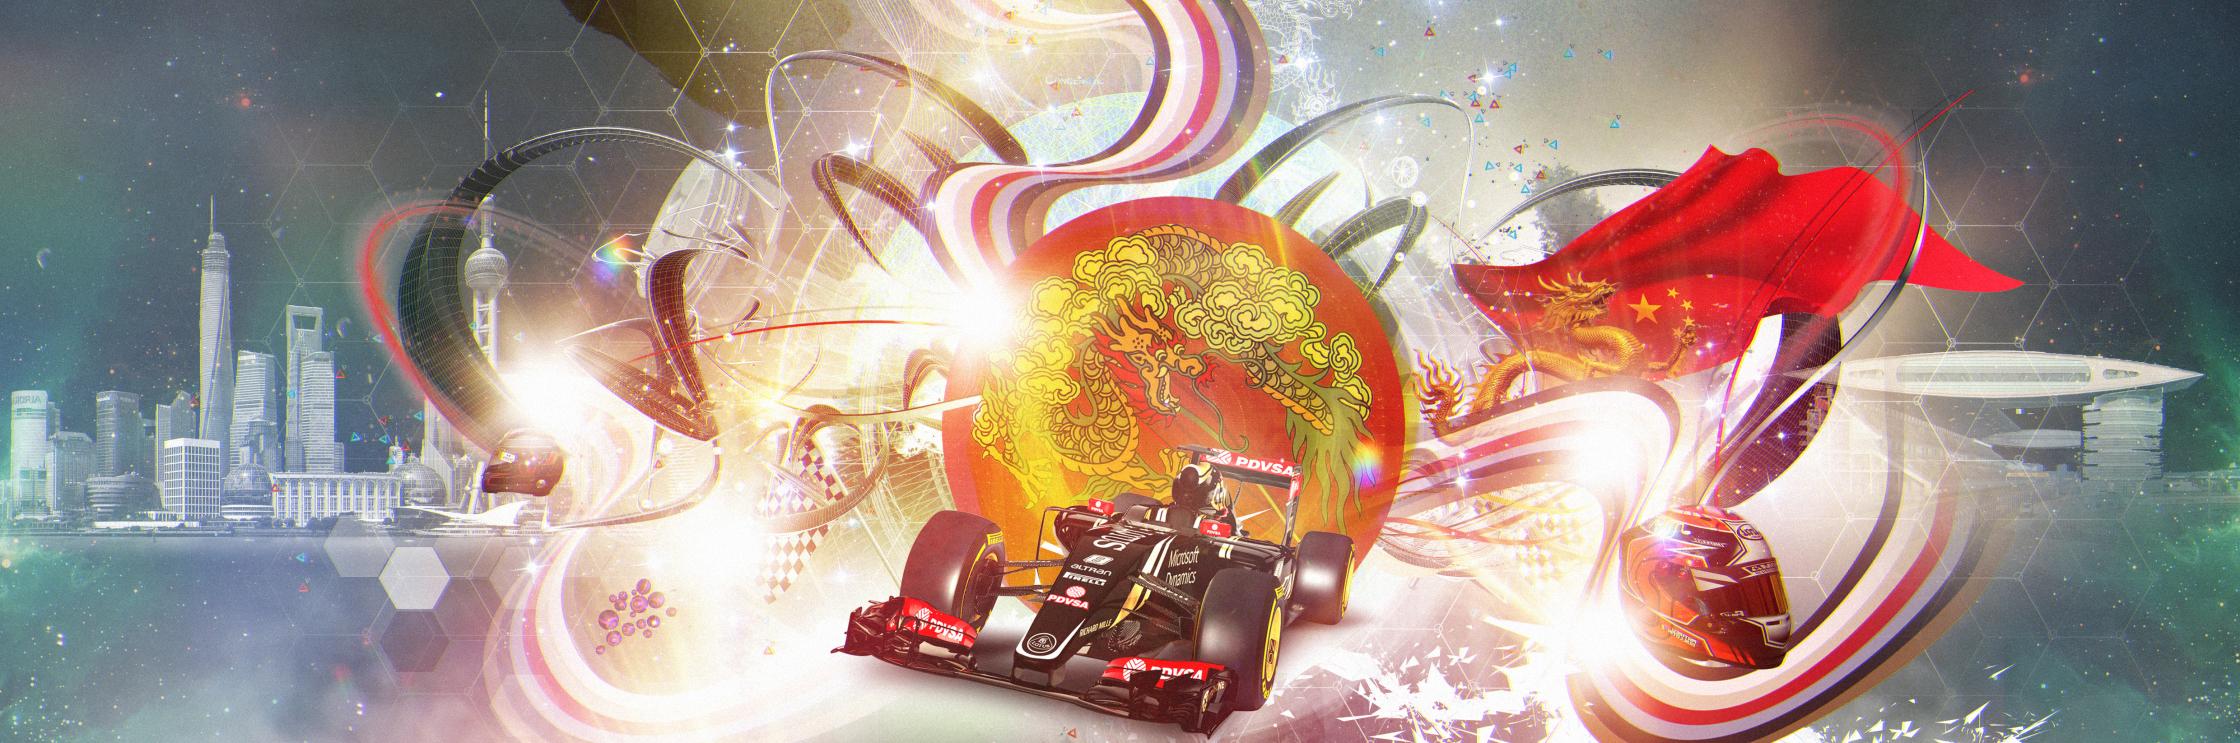 Chris Nurse Shanghai Grand Prix.jpg